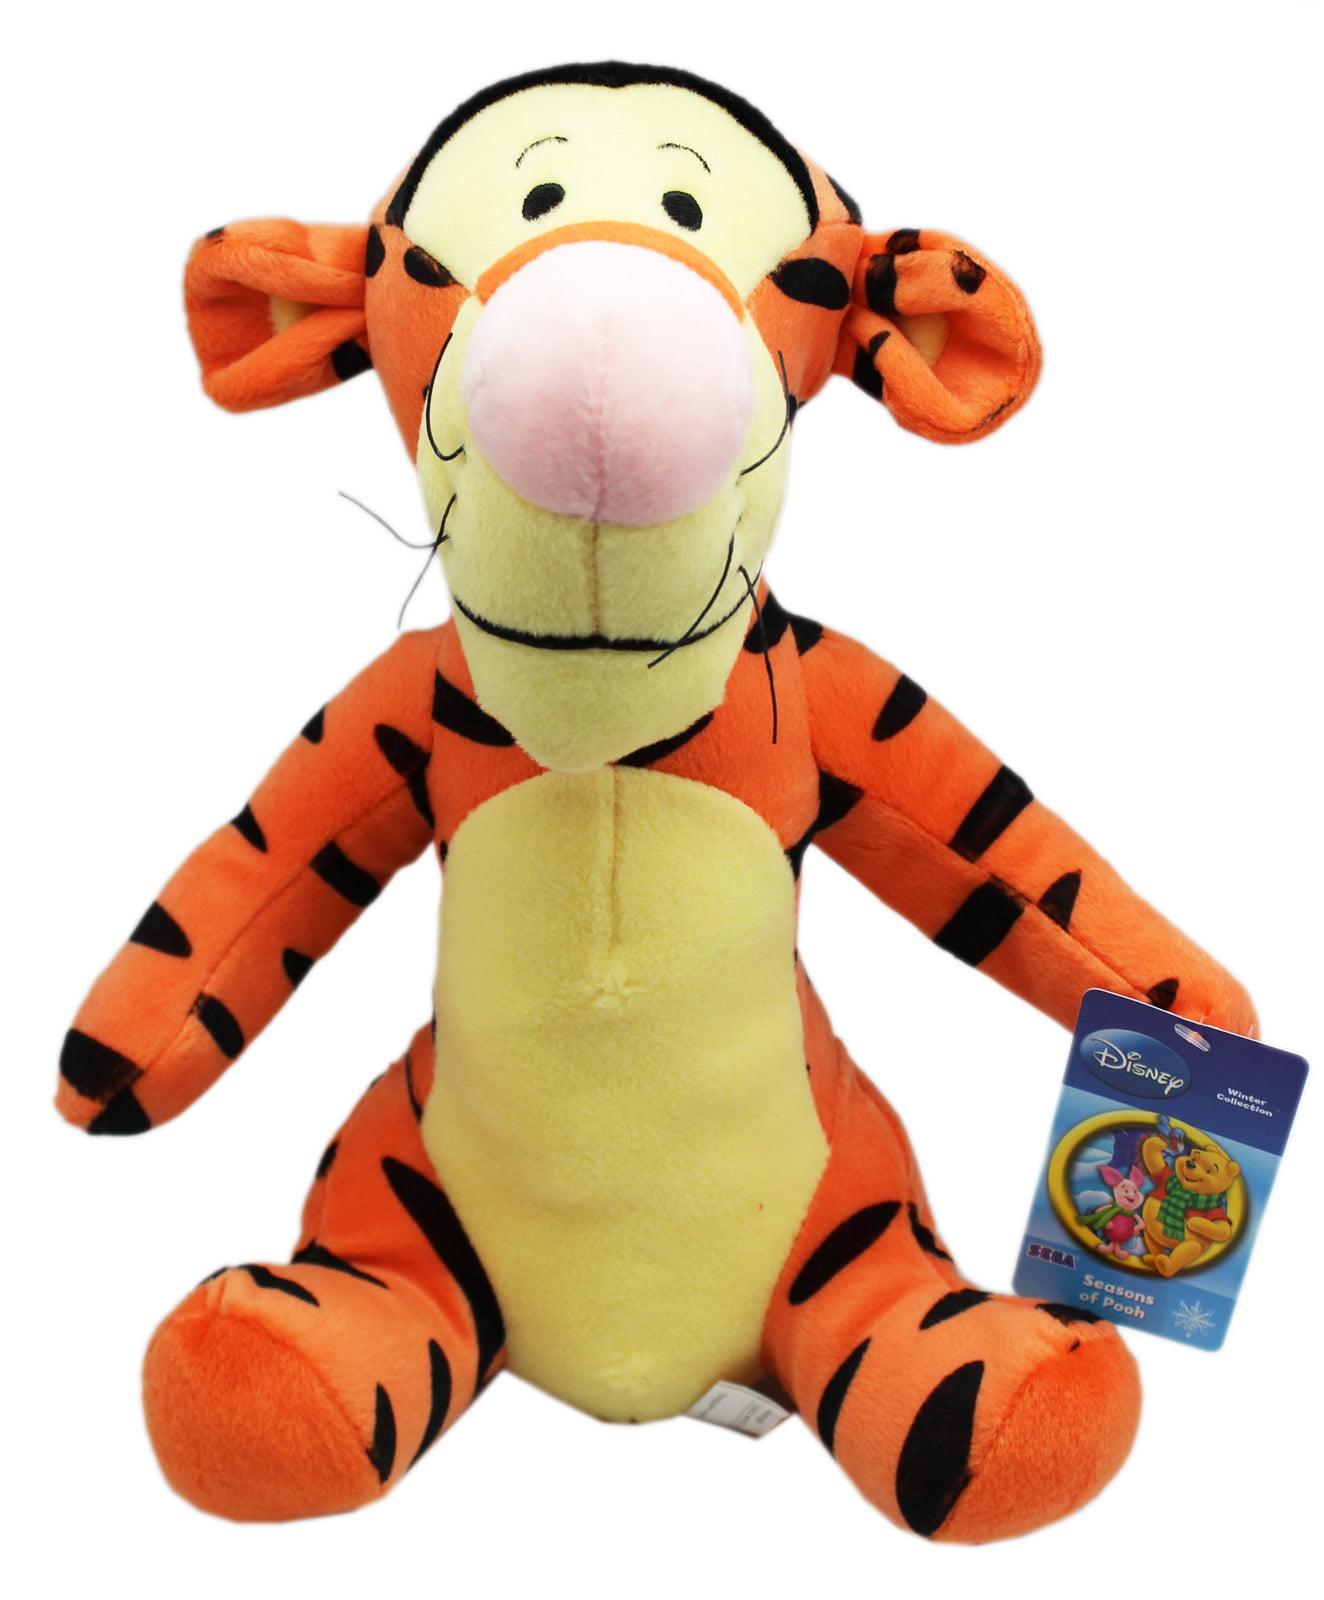 Disney's Winnie the Pooh Sitting Tigger Medium Size Kids Plush Toy (12in) by